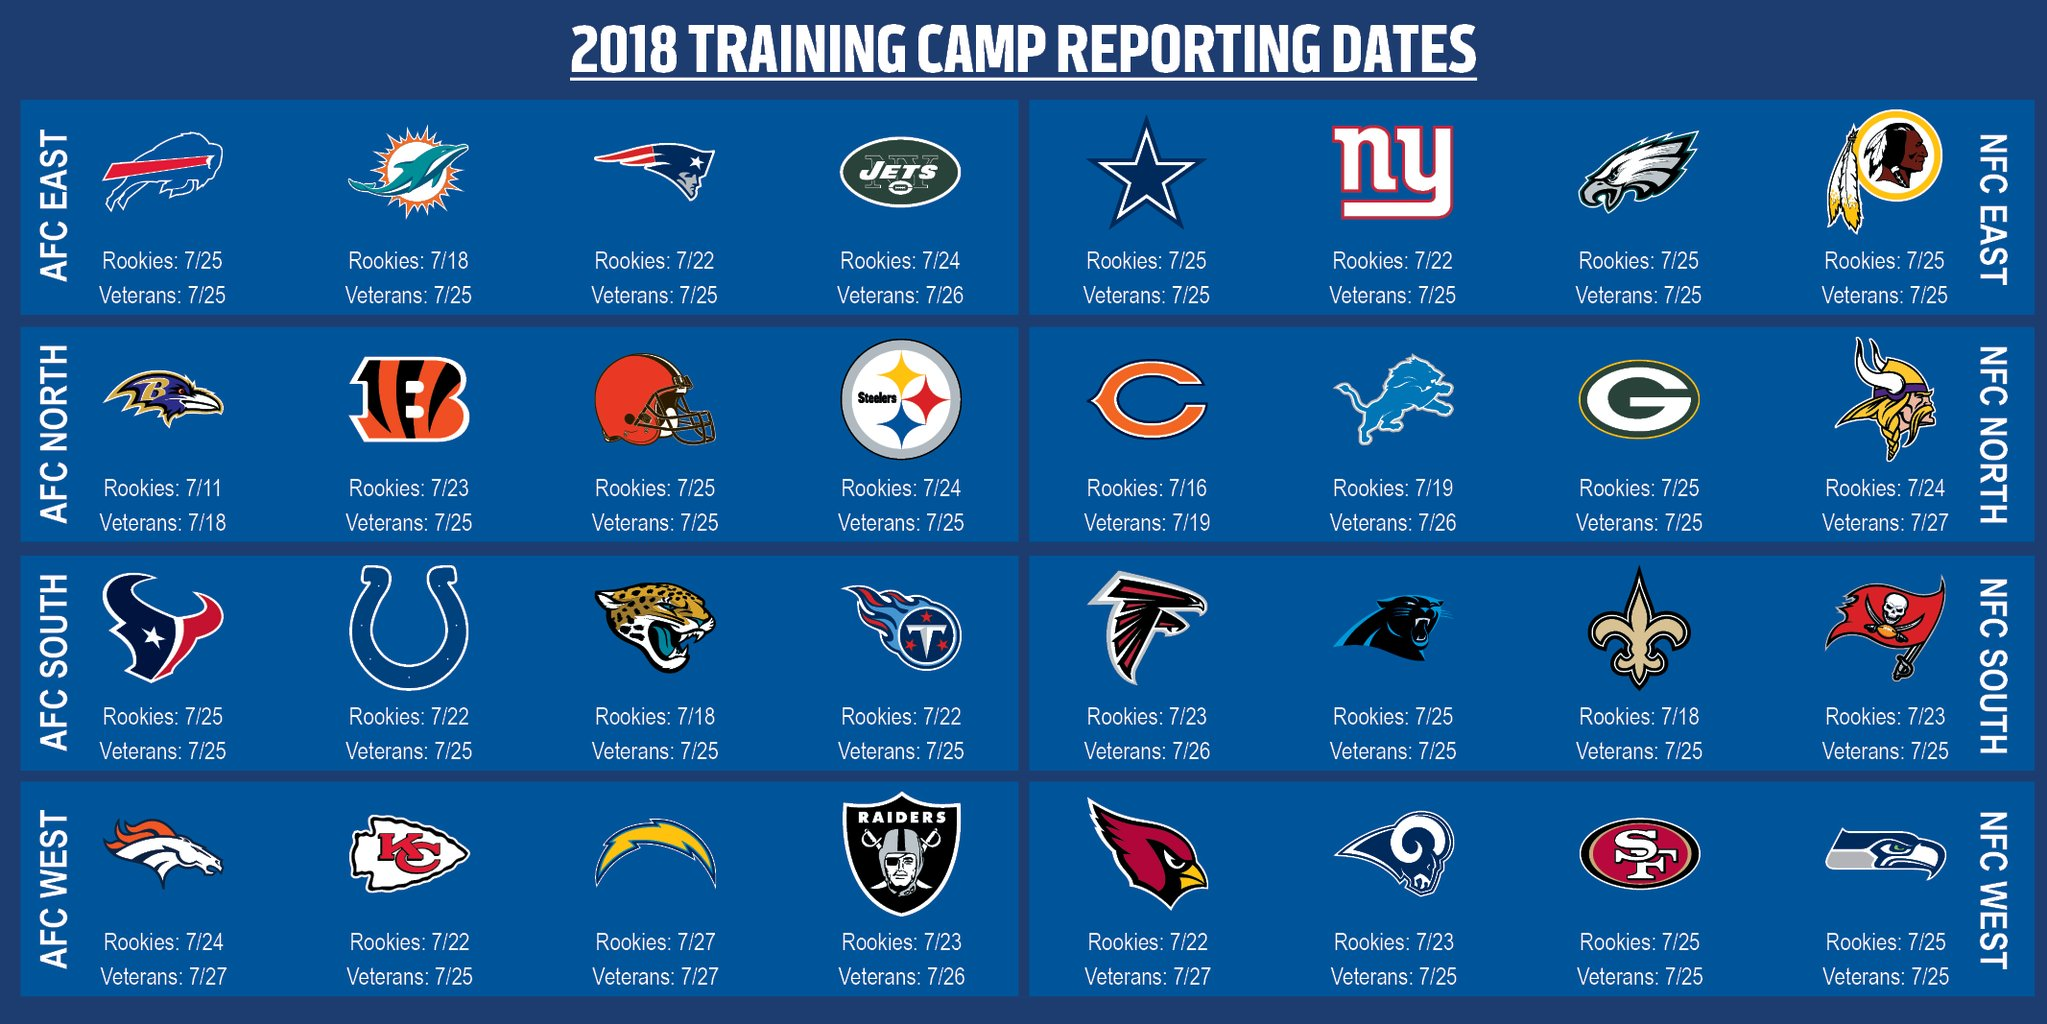 Date e luoghi dei training camp NFL 2018